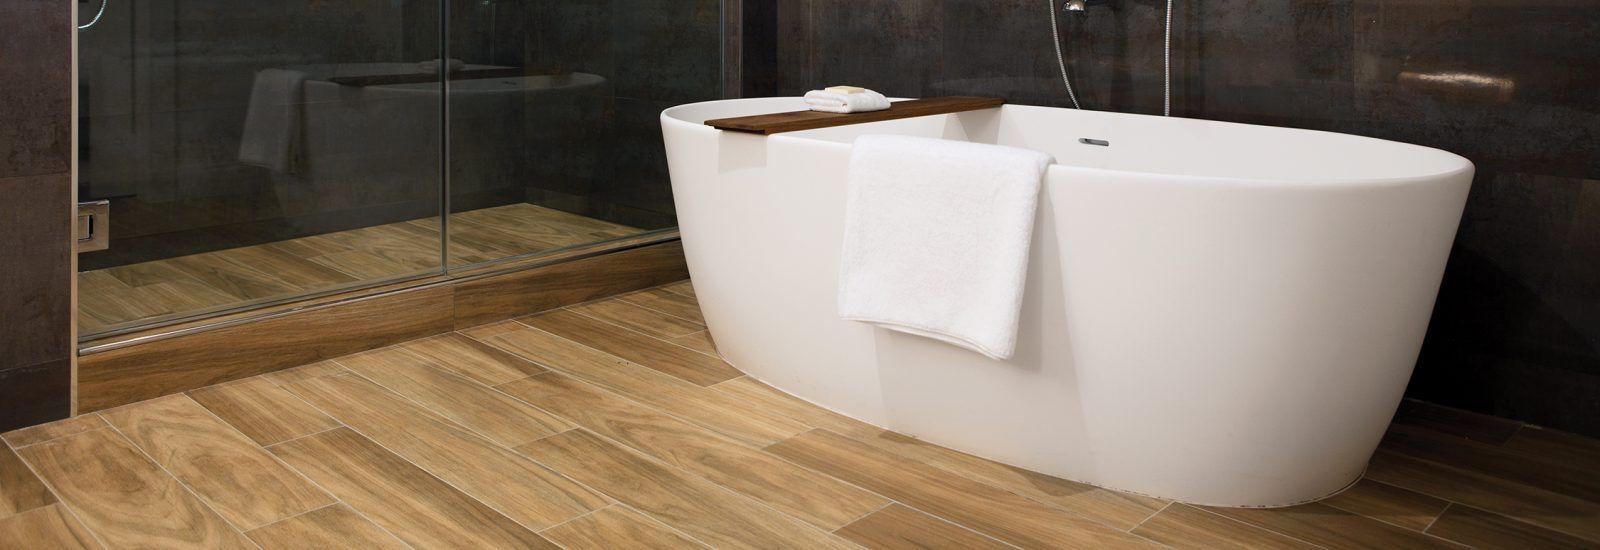 RM Living Cincinnati Modern Interior Design Bathrooms By MTI MTI9